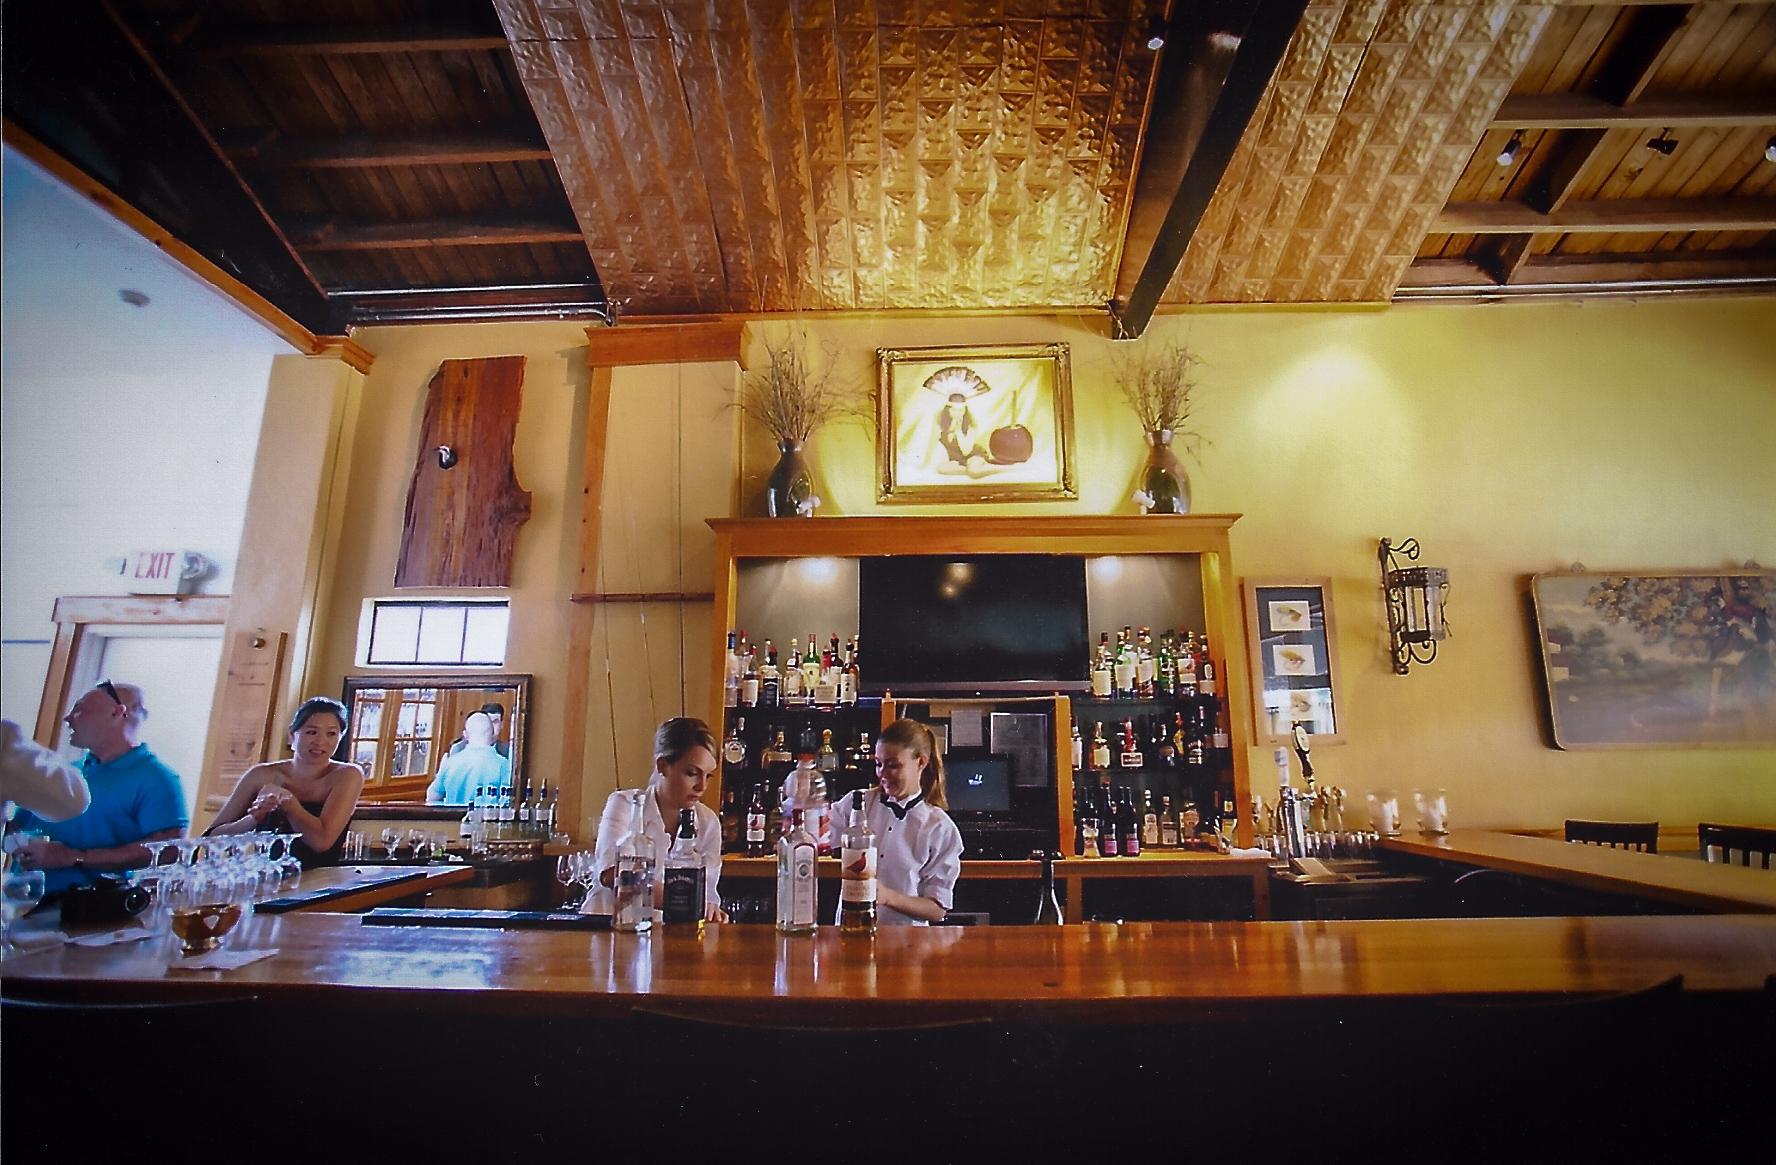 511 Rutledge - Event Venue - Professional Bar Service